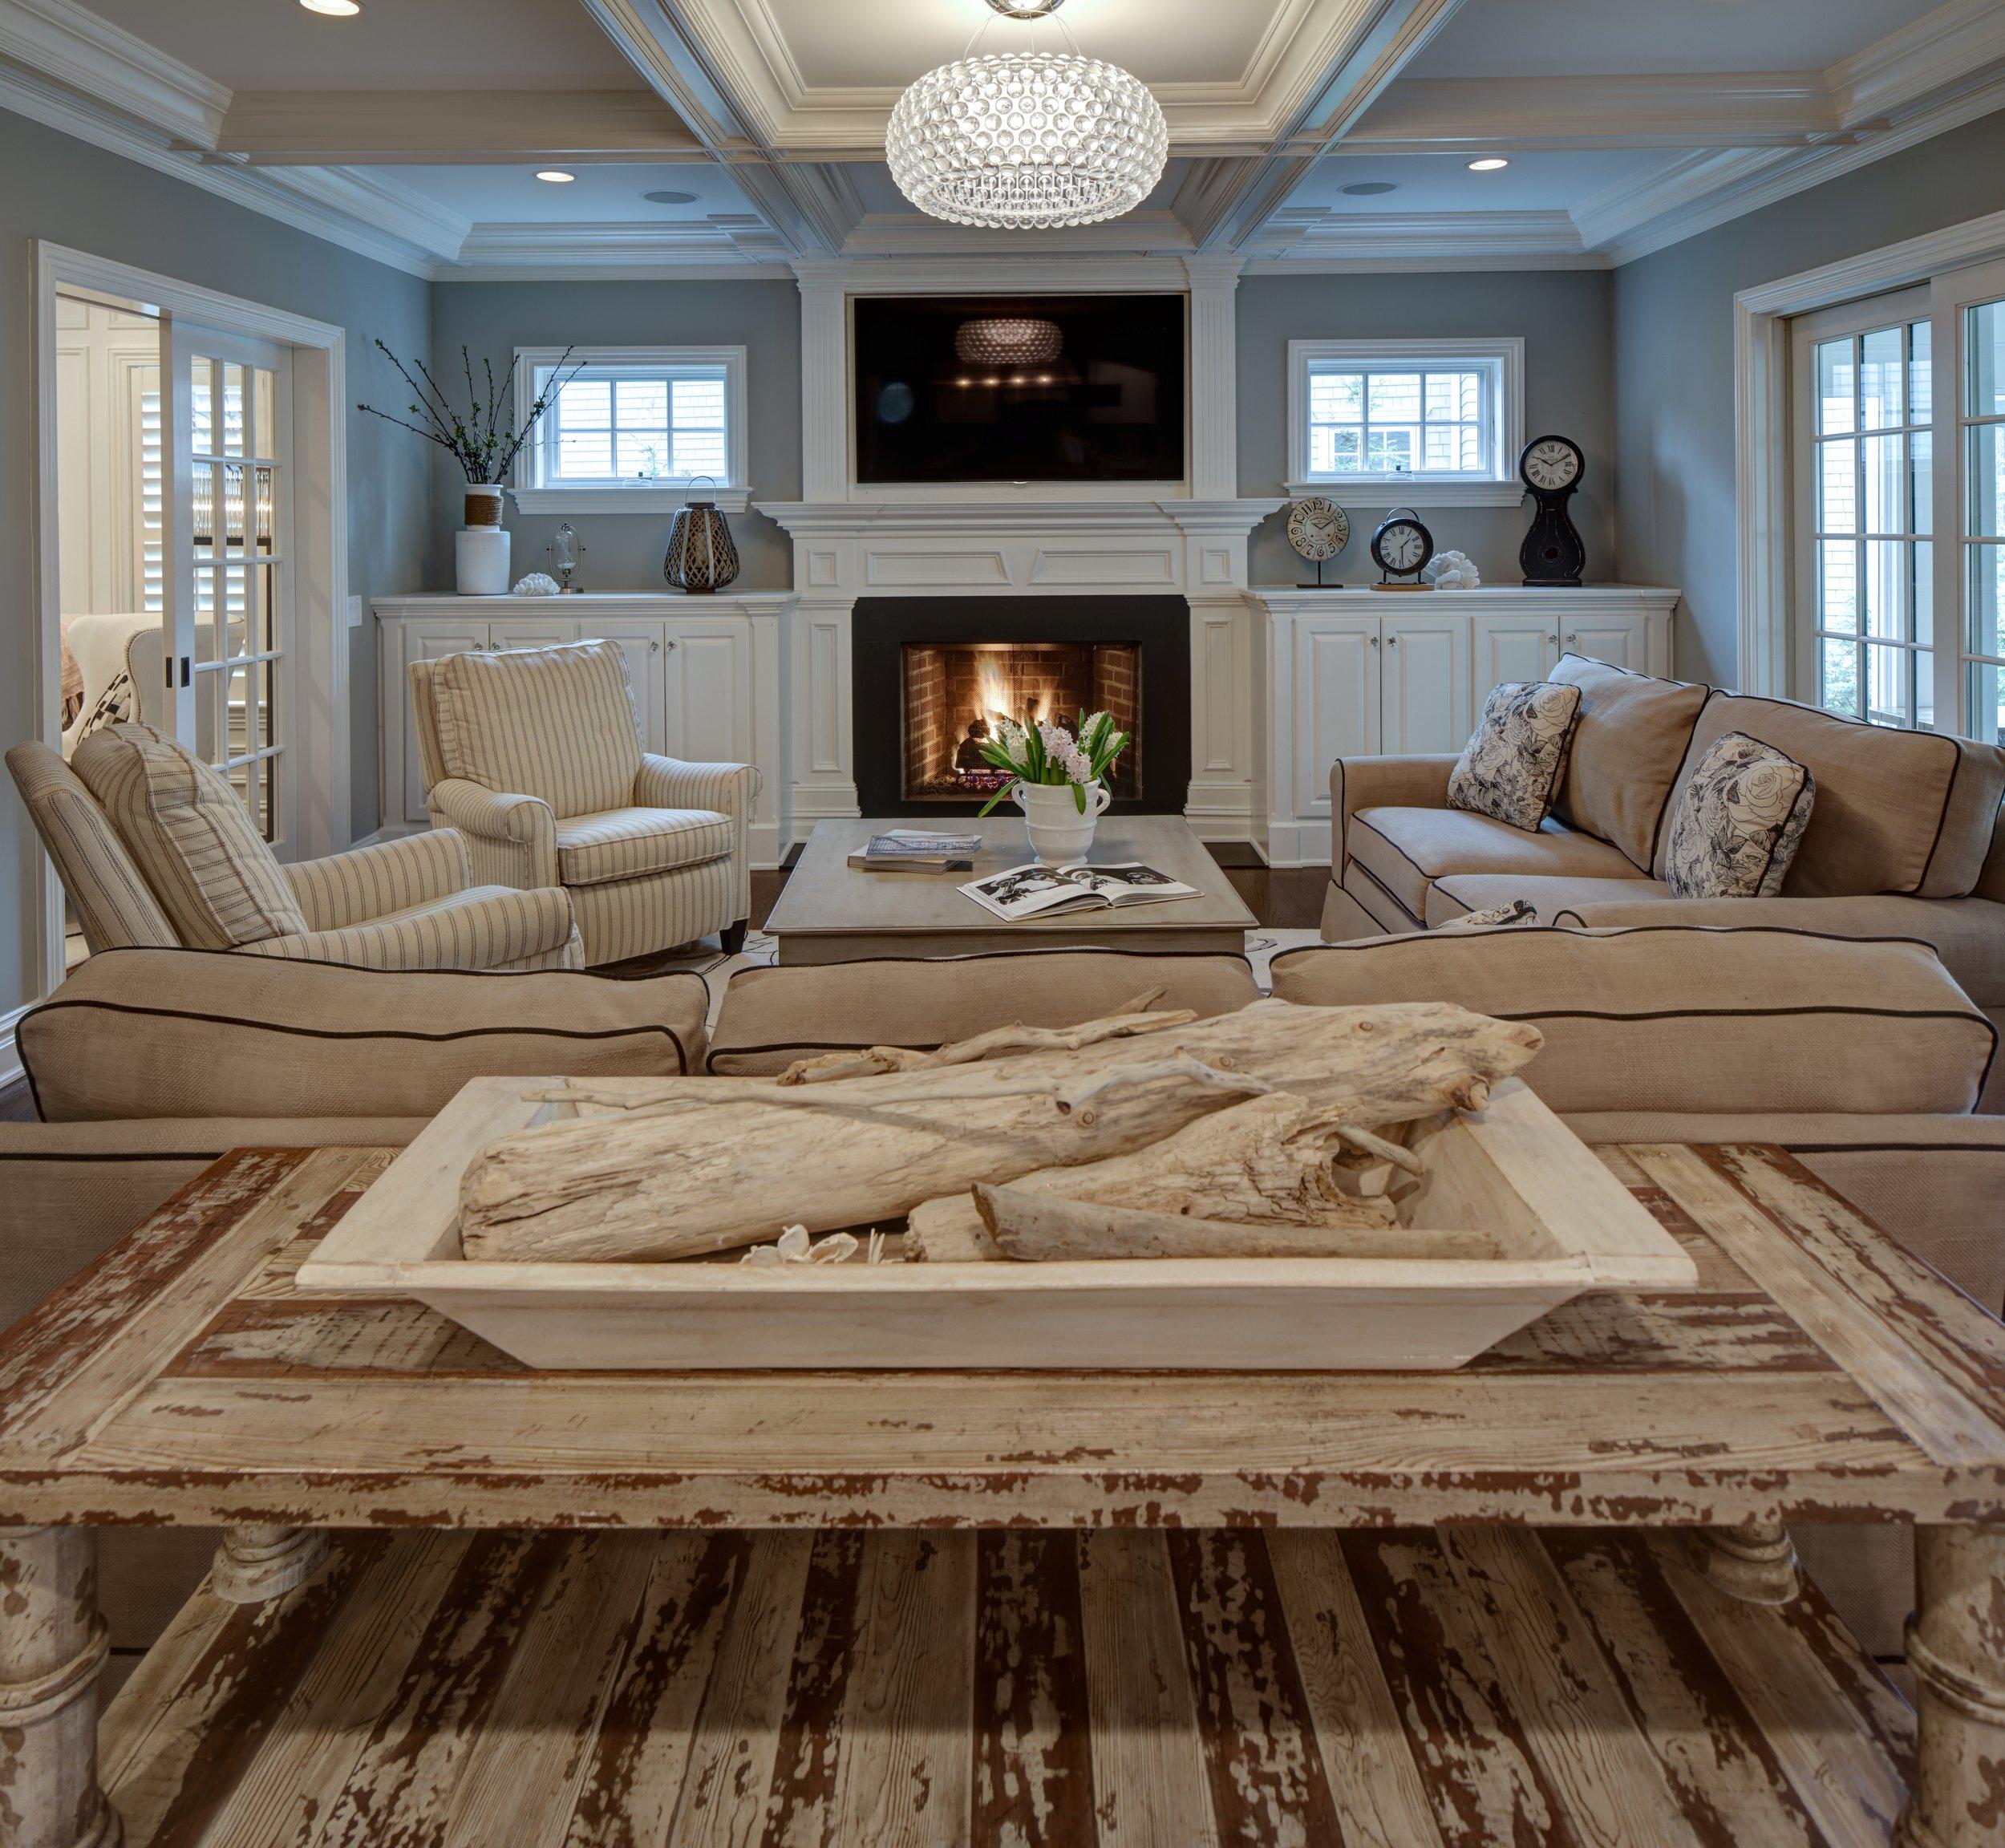 _W1A7673-89 MN Strulowitz (Living room Updown) lvl5.jpg